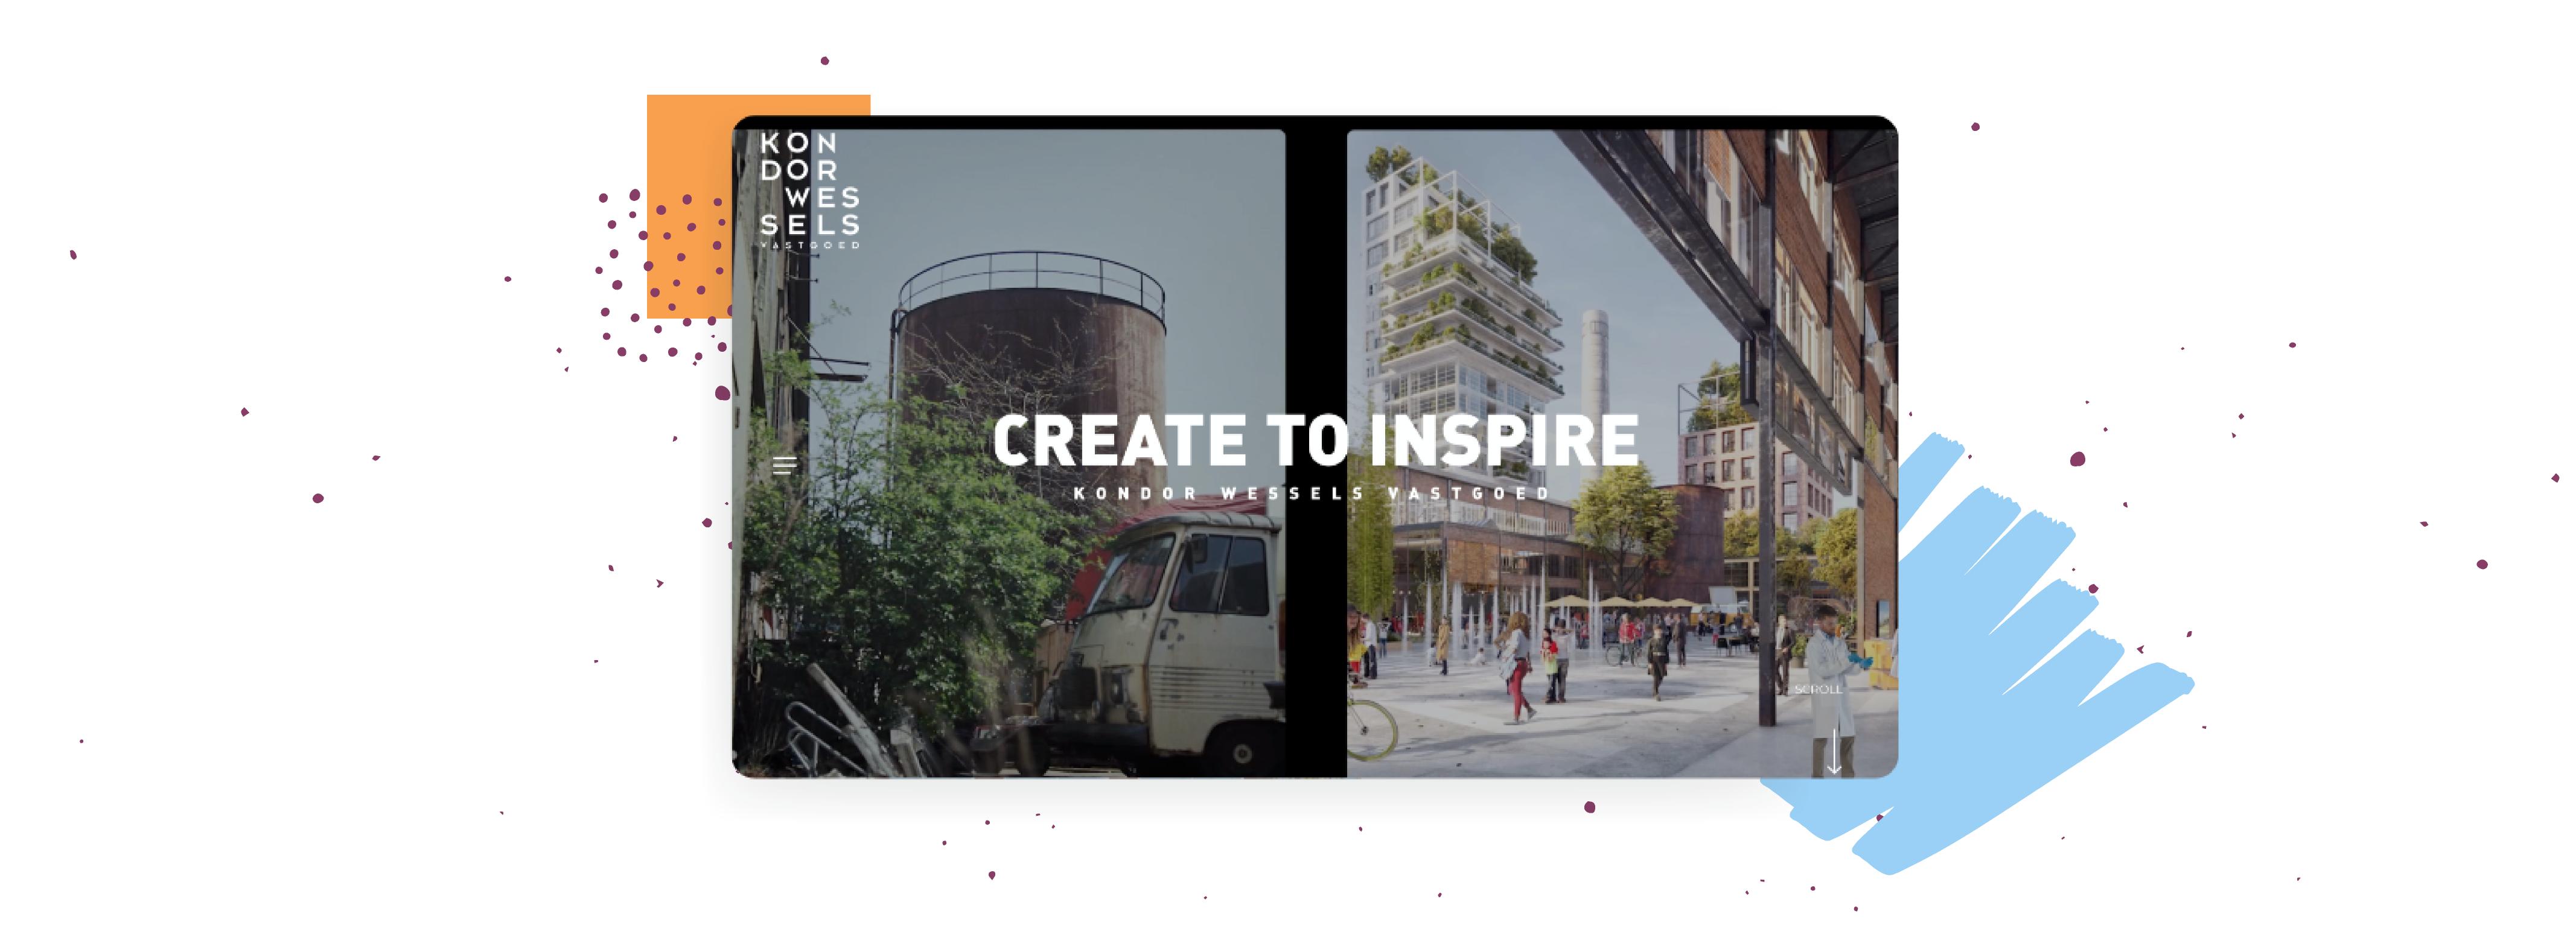 Create to inspire